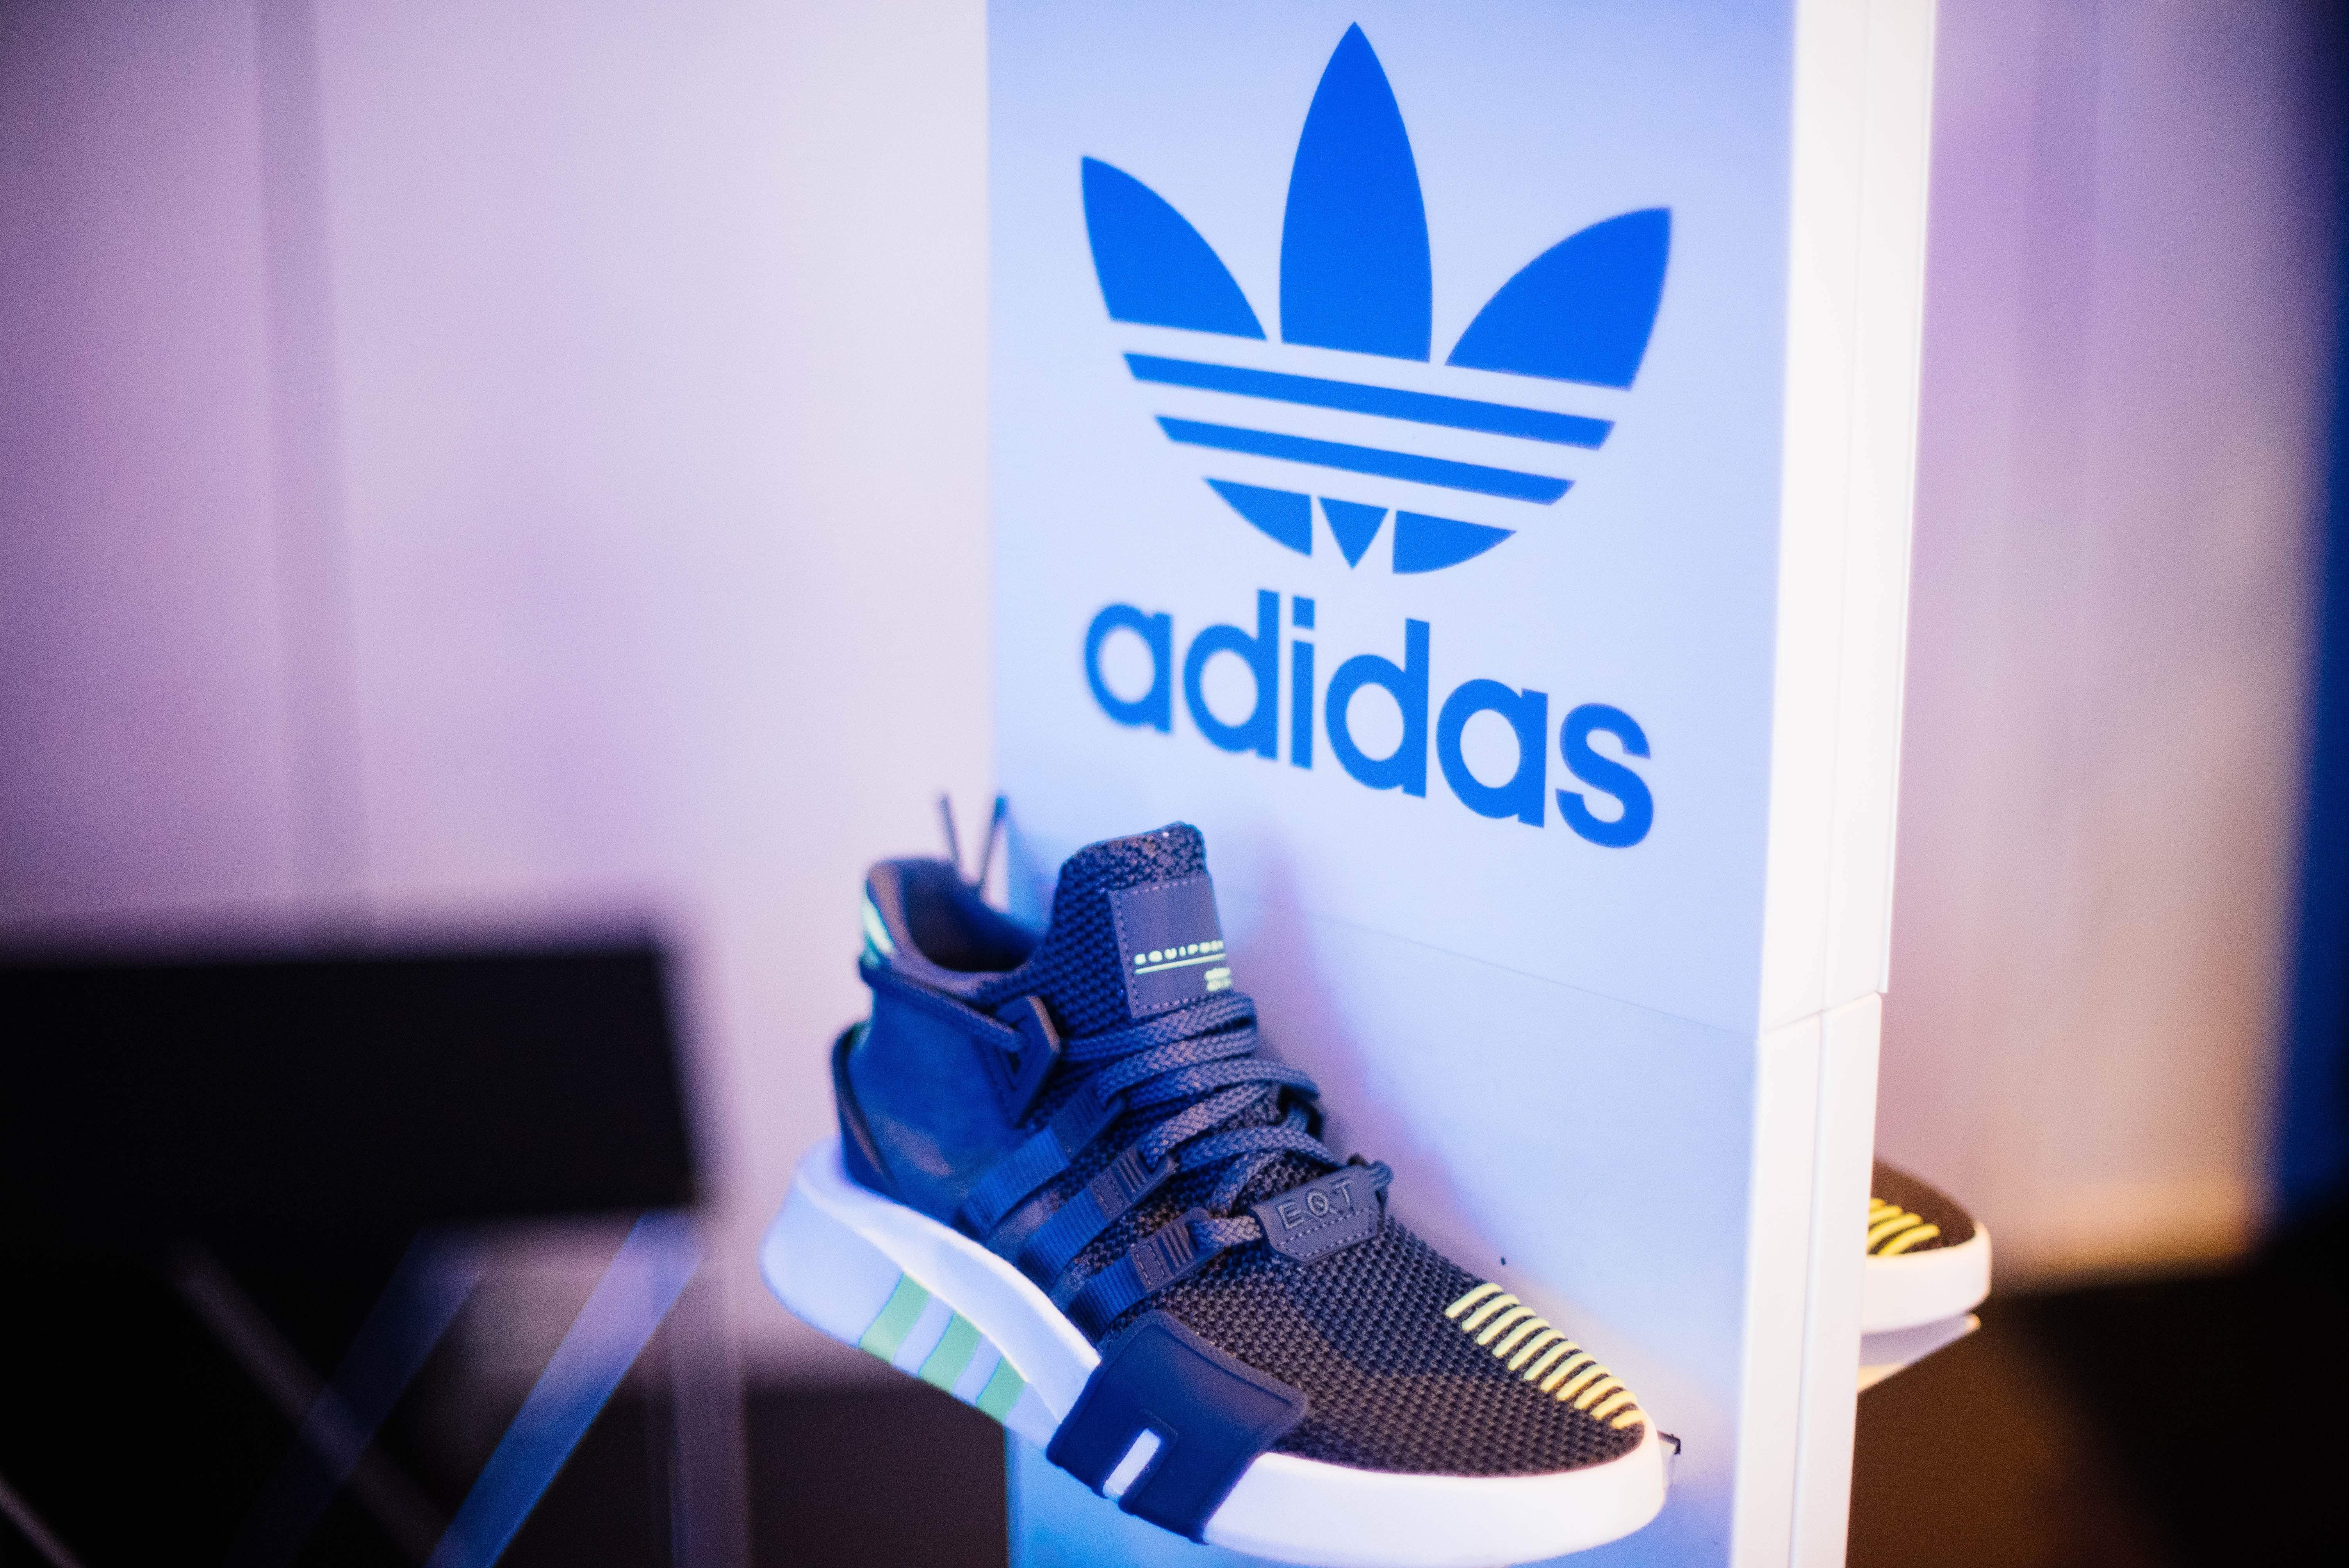 Adidas store display of sneakers